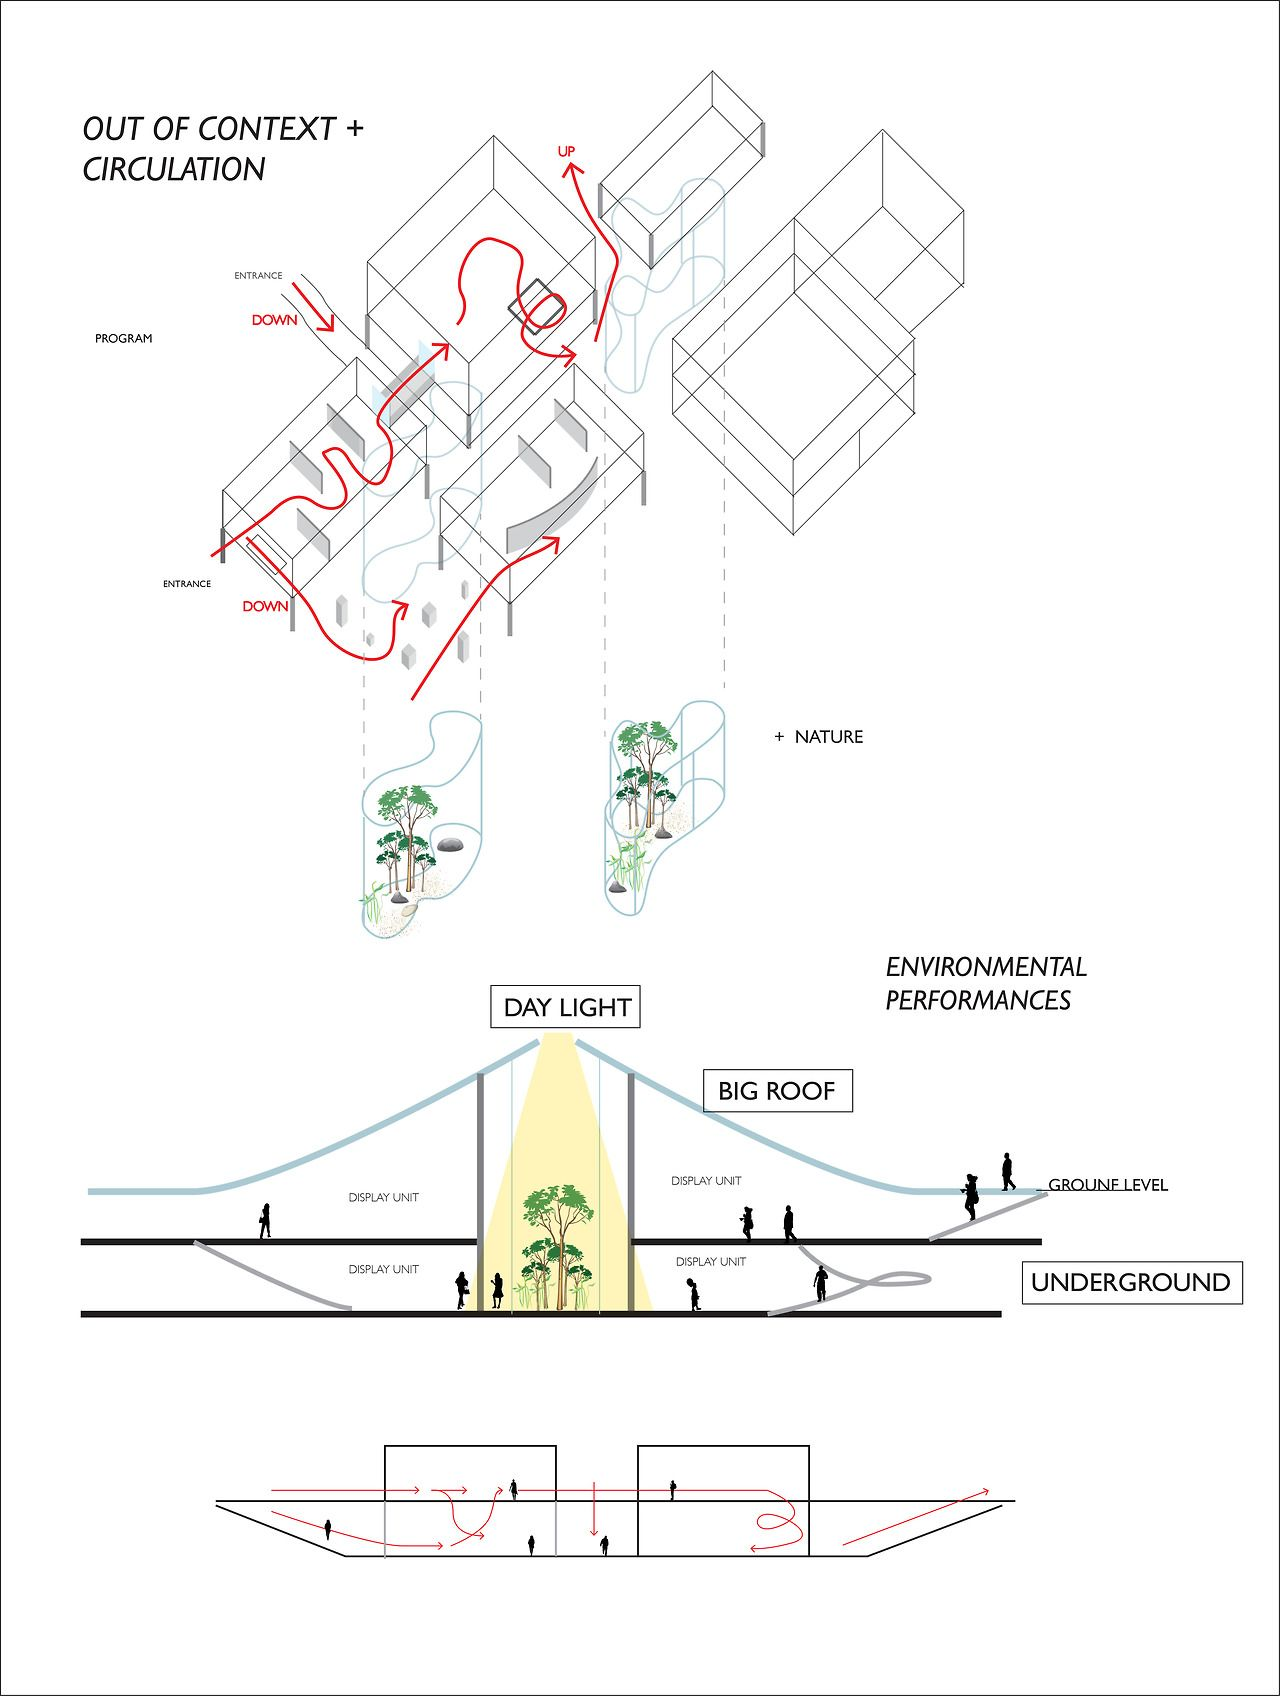 hight resolution of chacha chanya niyomsith 5434726425 section and circulation diagram illustrating the environmental performances and circulation